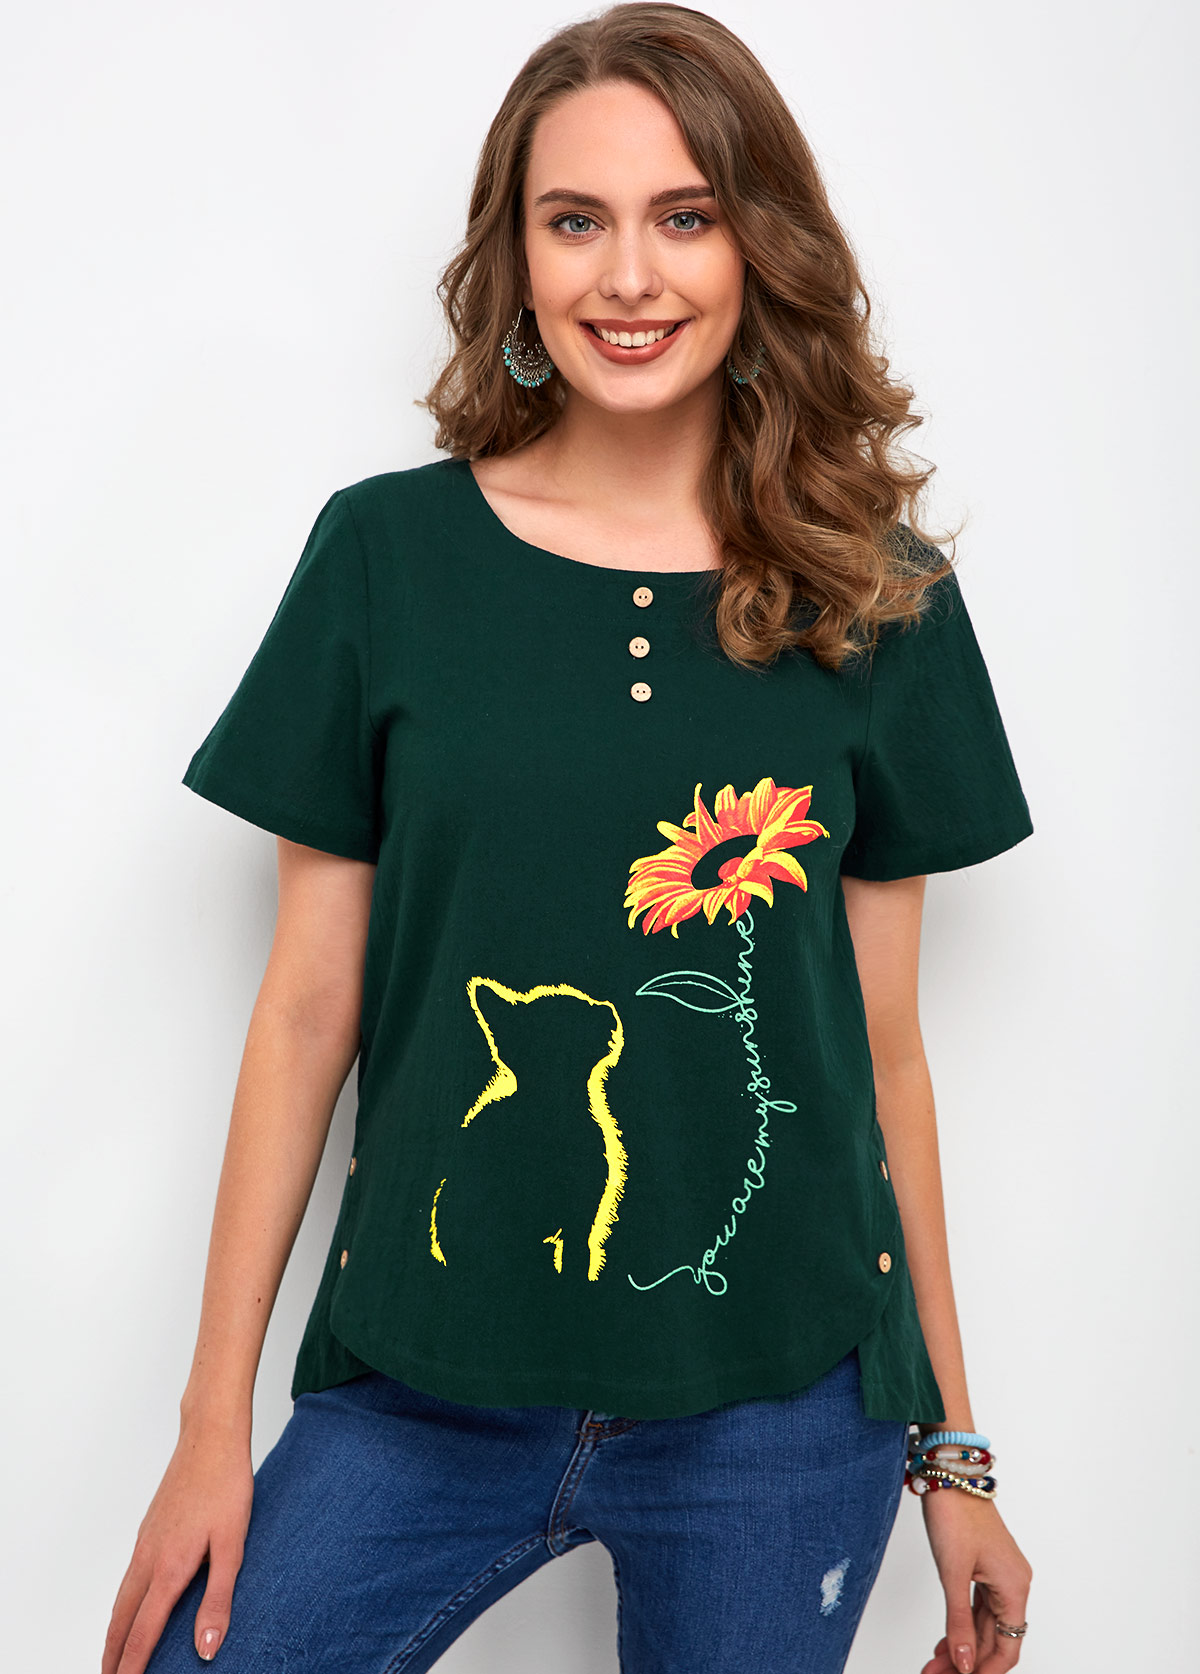 Short Sleeve Sunflower Print Round Neck T Shirt